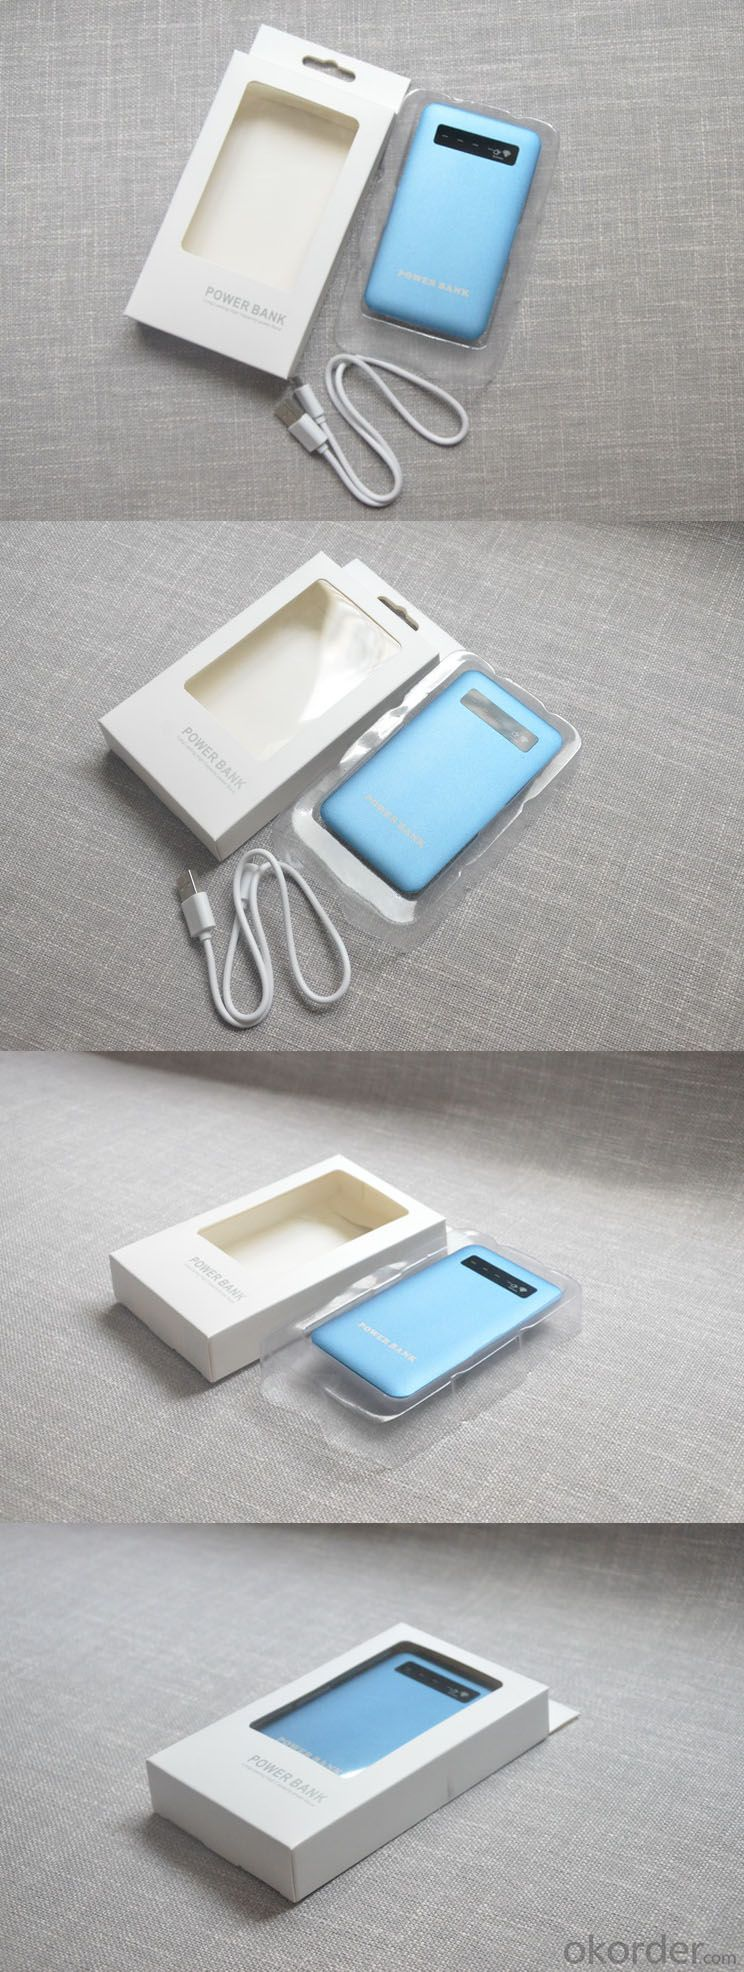 Ultrathin Portable Mobile Power 4000mAh Power Bank for iPhone6 (SPB-1002)